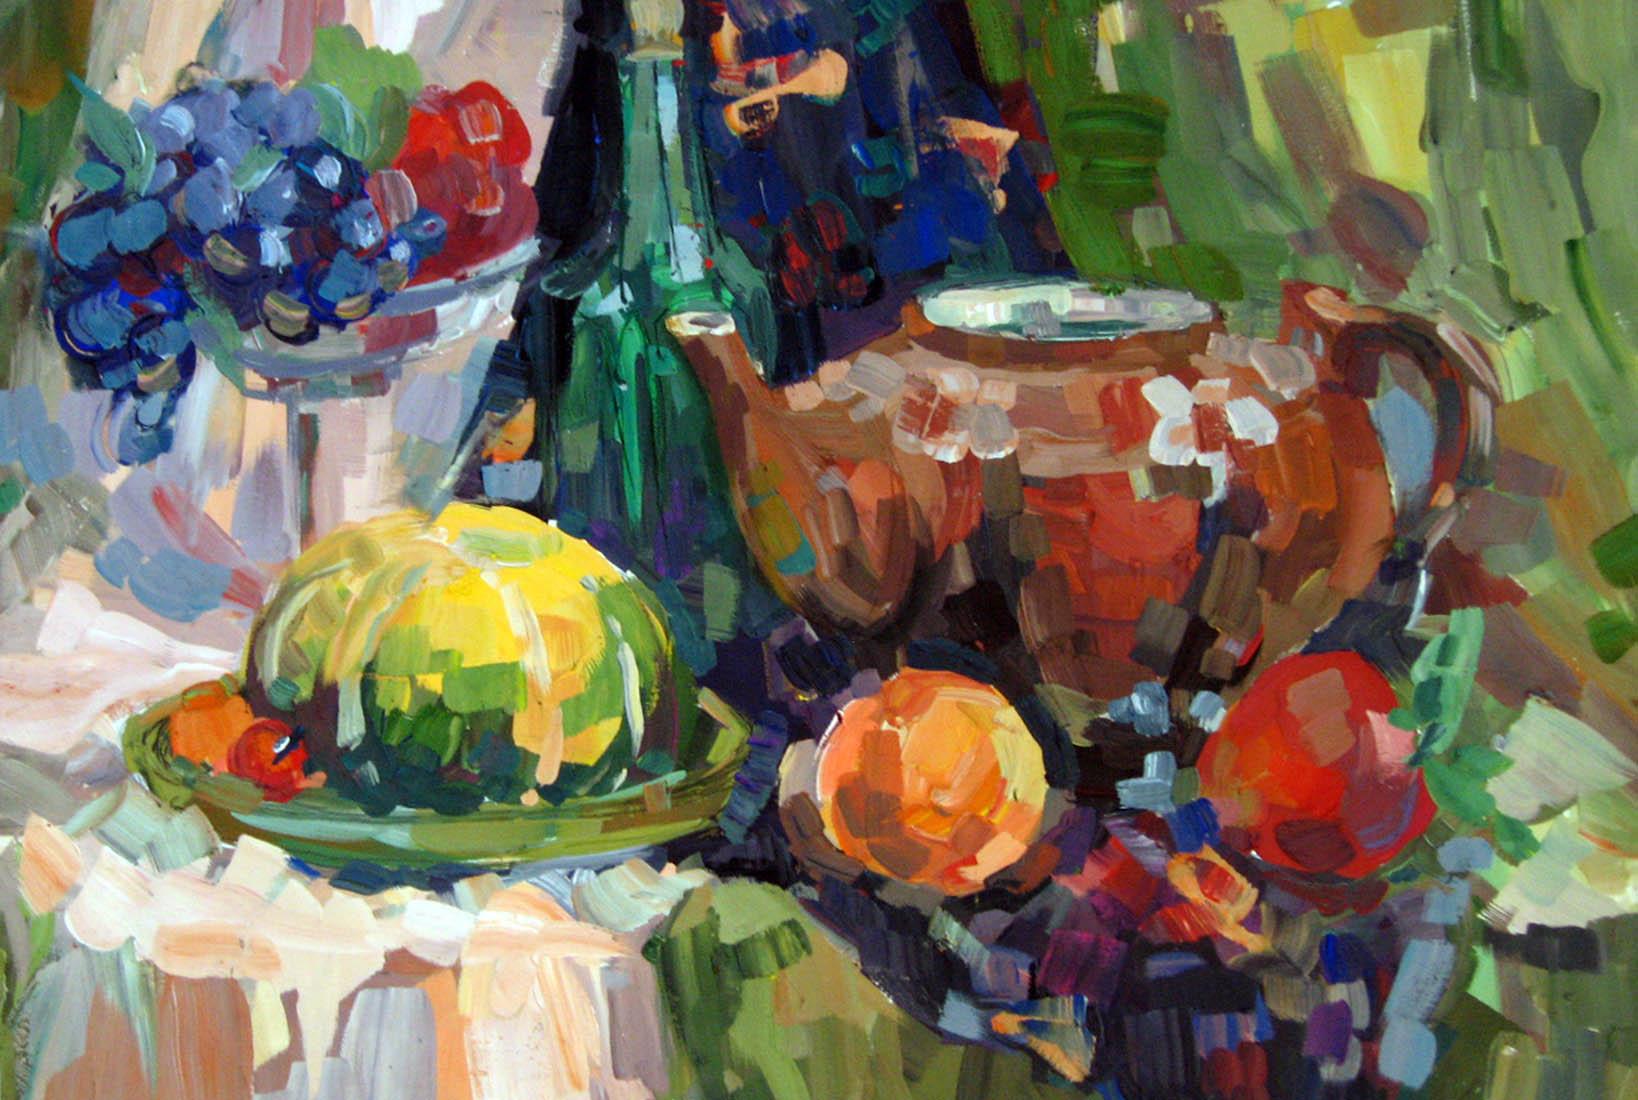 Polina-Shubkina-Paintings-021.jpg